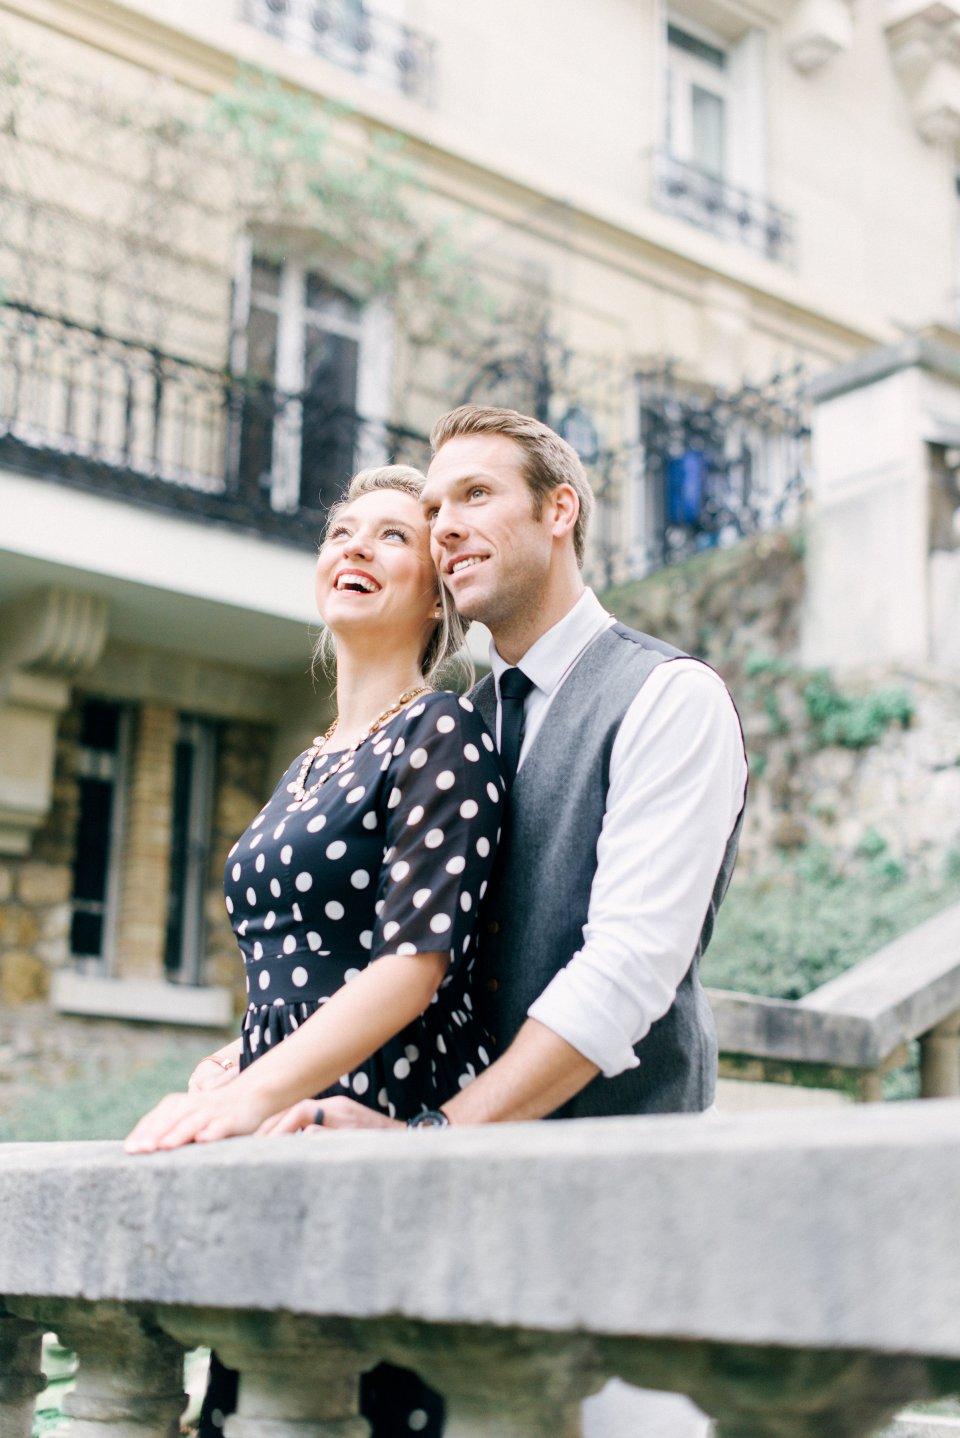 Brooke & Doug's Vintage Inspired Paris Photoshoot